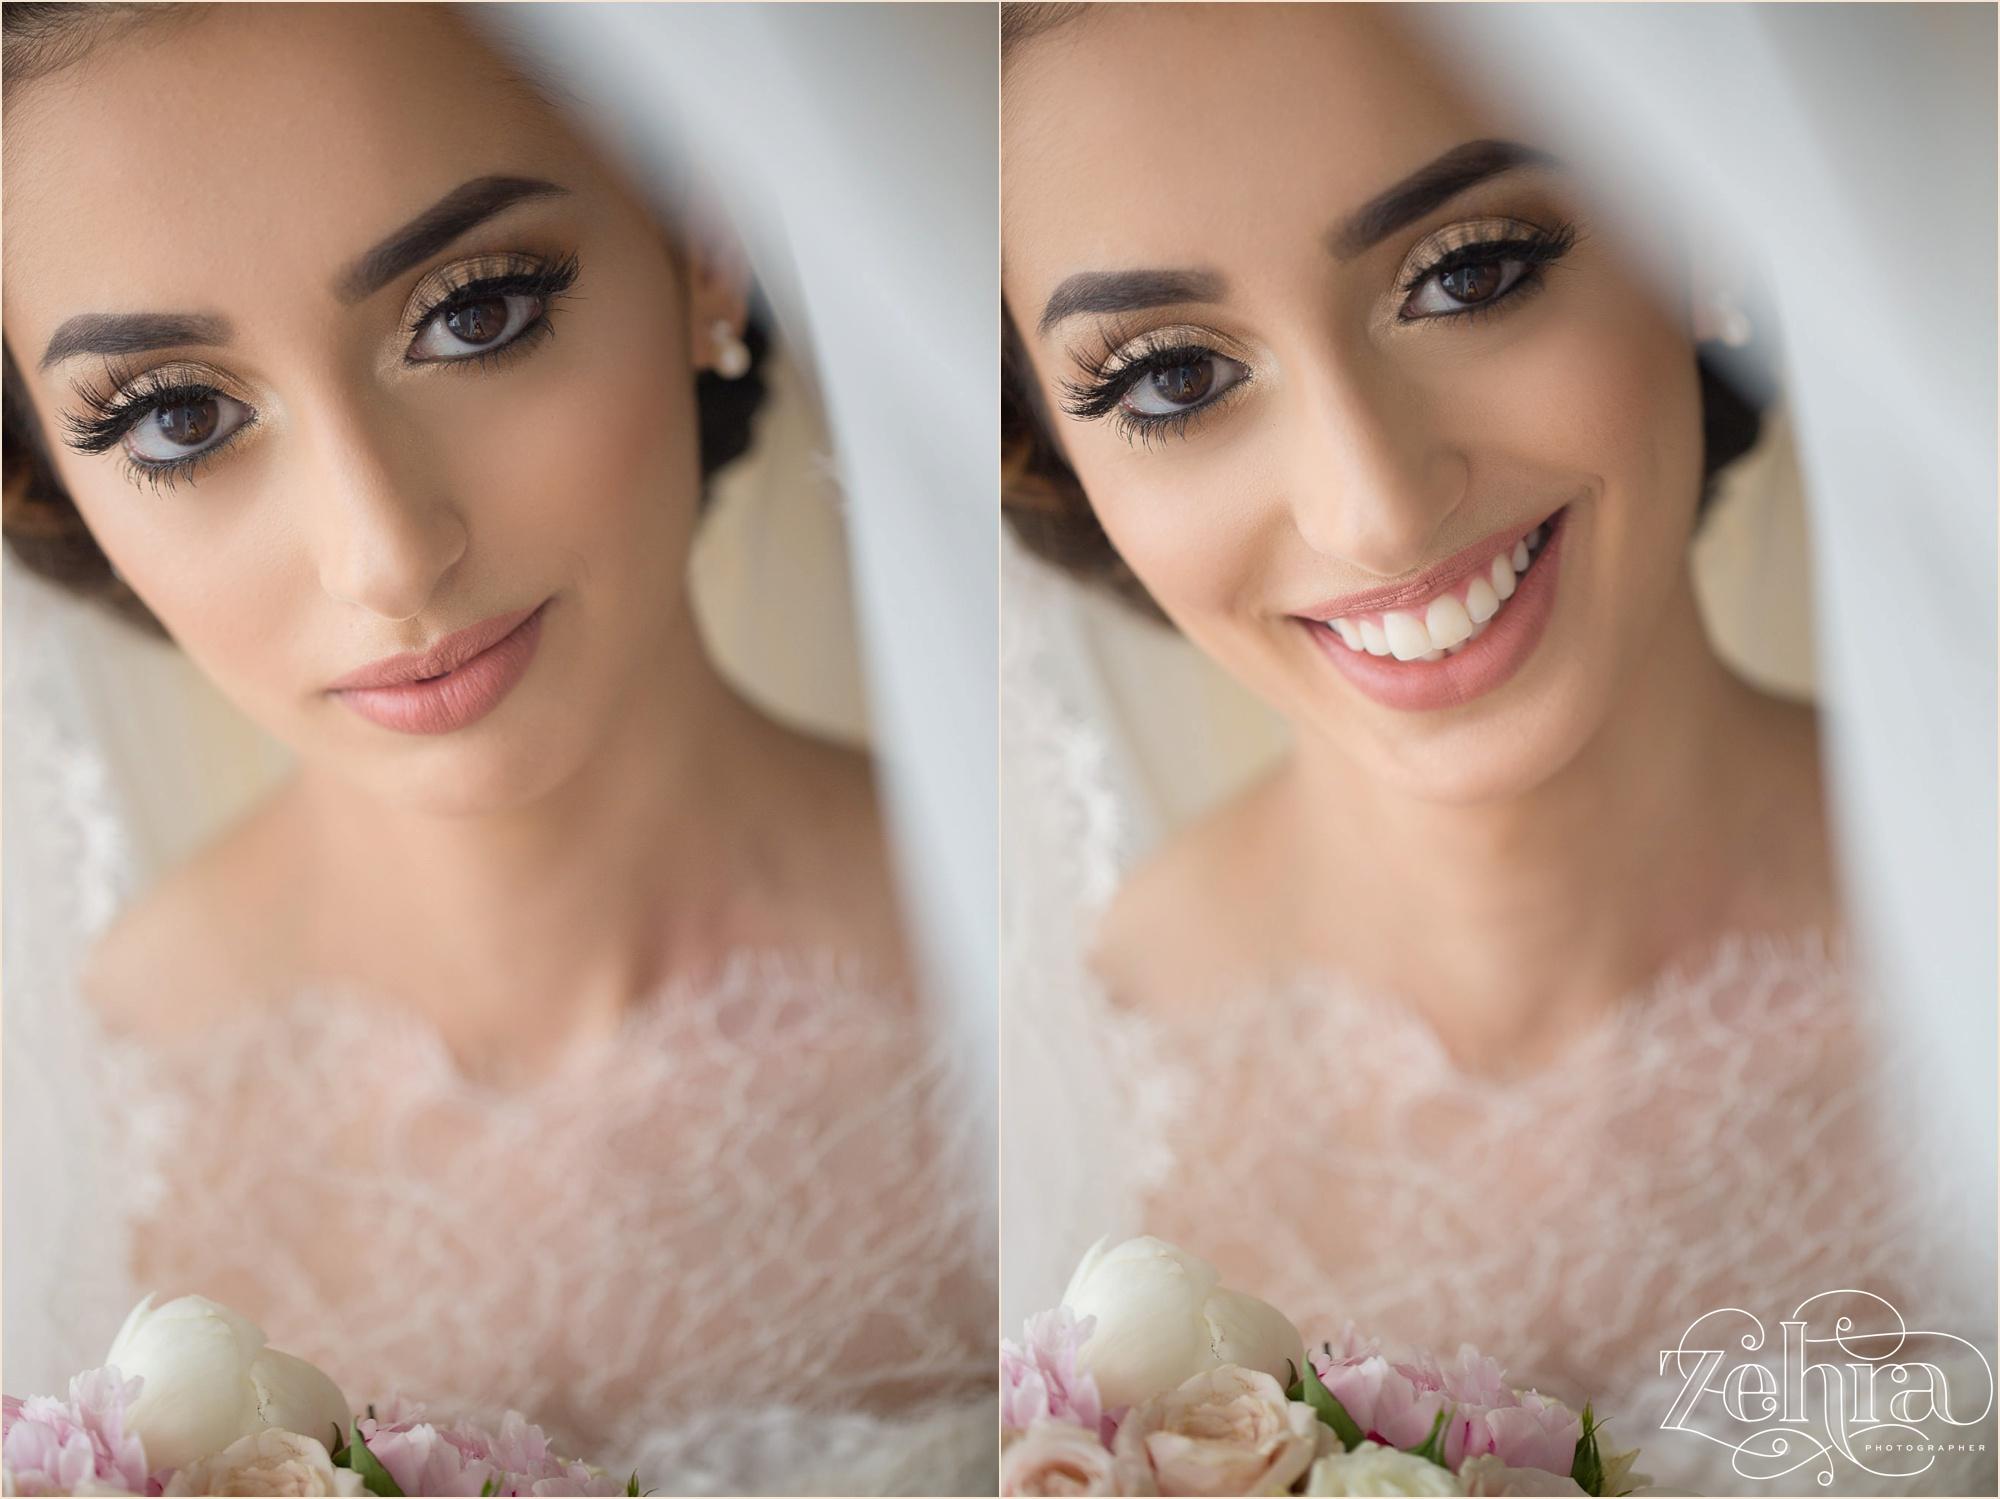 jasira manchester wedding photographer_0020.jpg